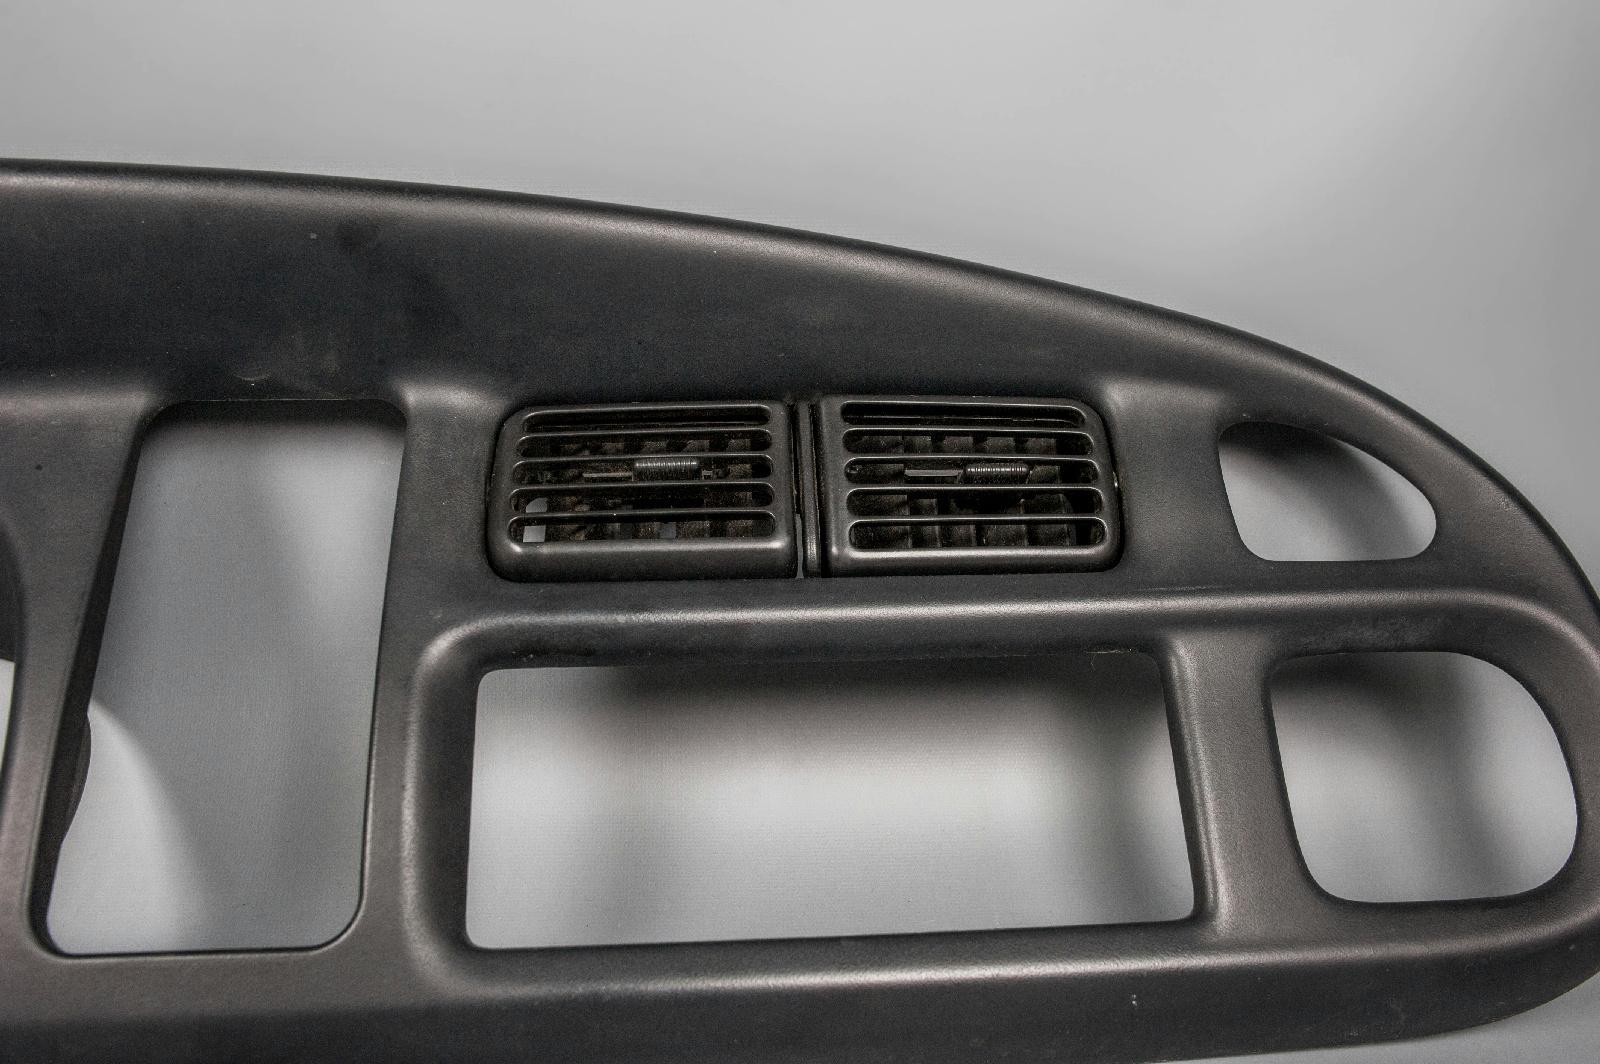 1998 2001 Dodge Ram 1500 2500 3500 Dash Trim Bezel With Vents Ebay